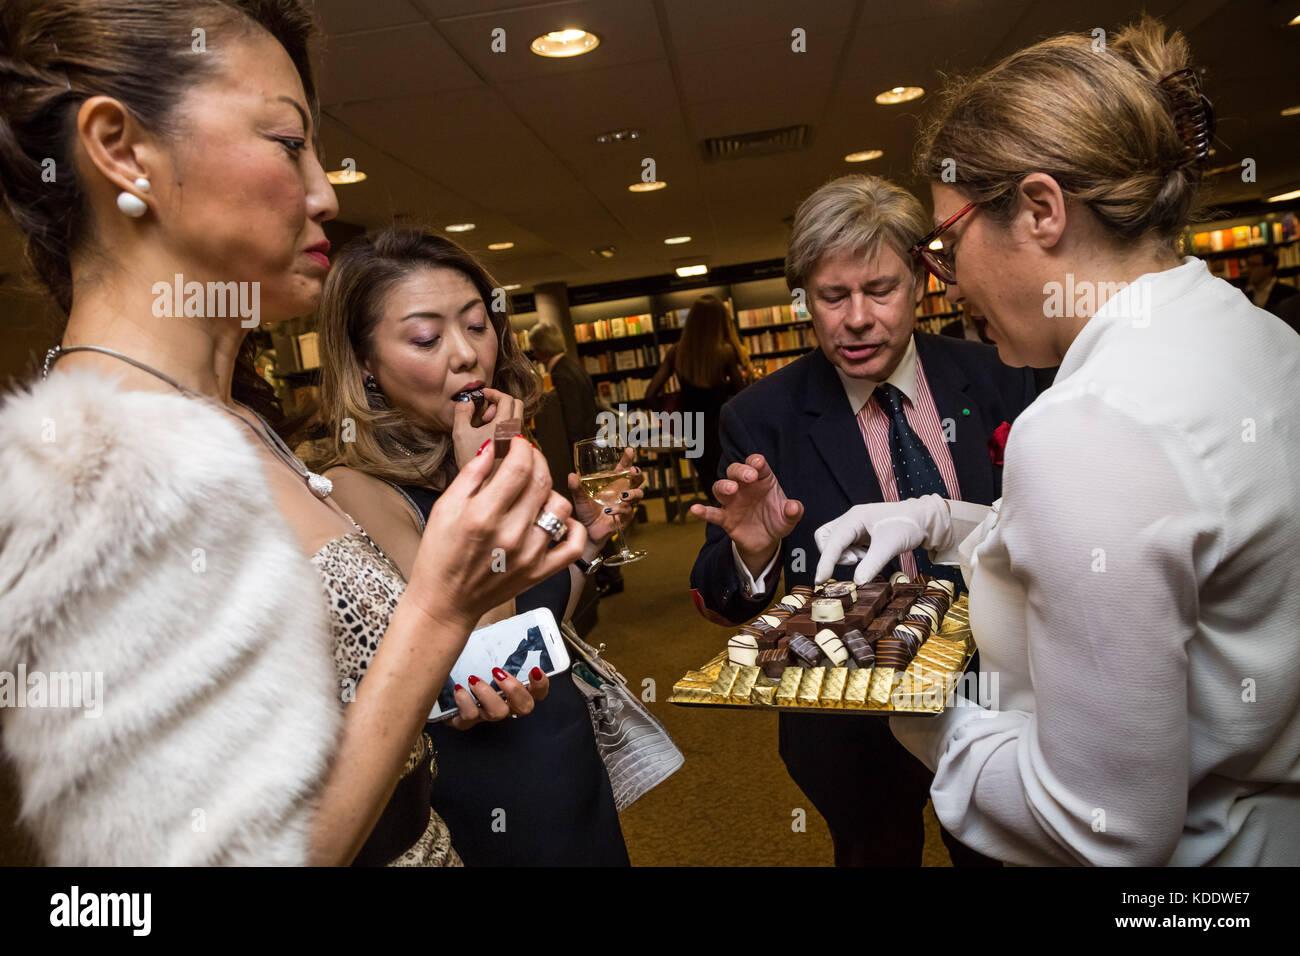 London, UK. 12th Oct, 2017. Princess Olga Romanoff, descendant of the last Tsar of Russia, Nicholas II, signs copies - Stock Image